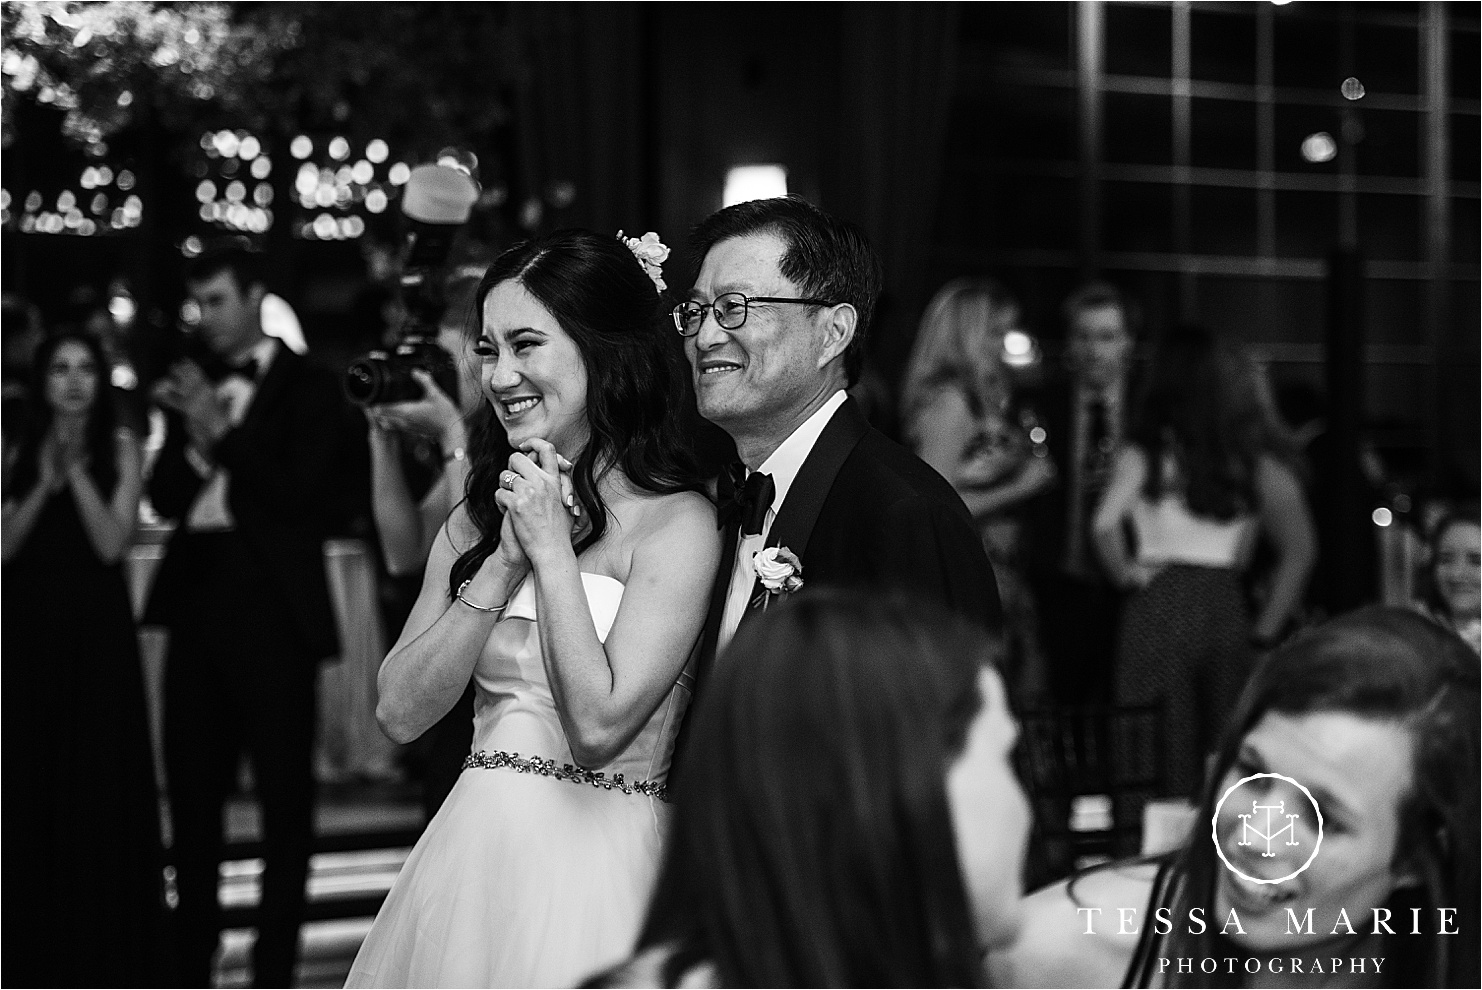 Tessa_marie_weddings_houston_wedding_photographer_The_astorian_0171.jpg